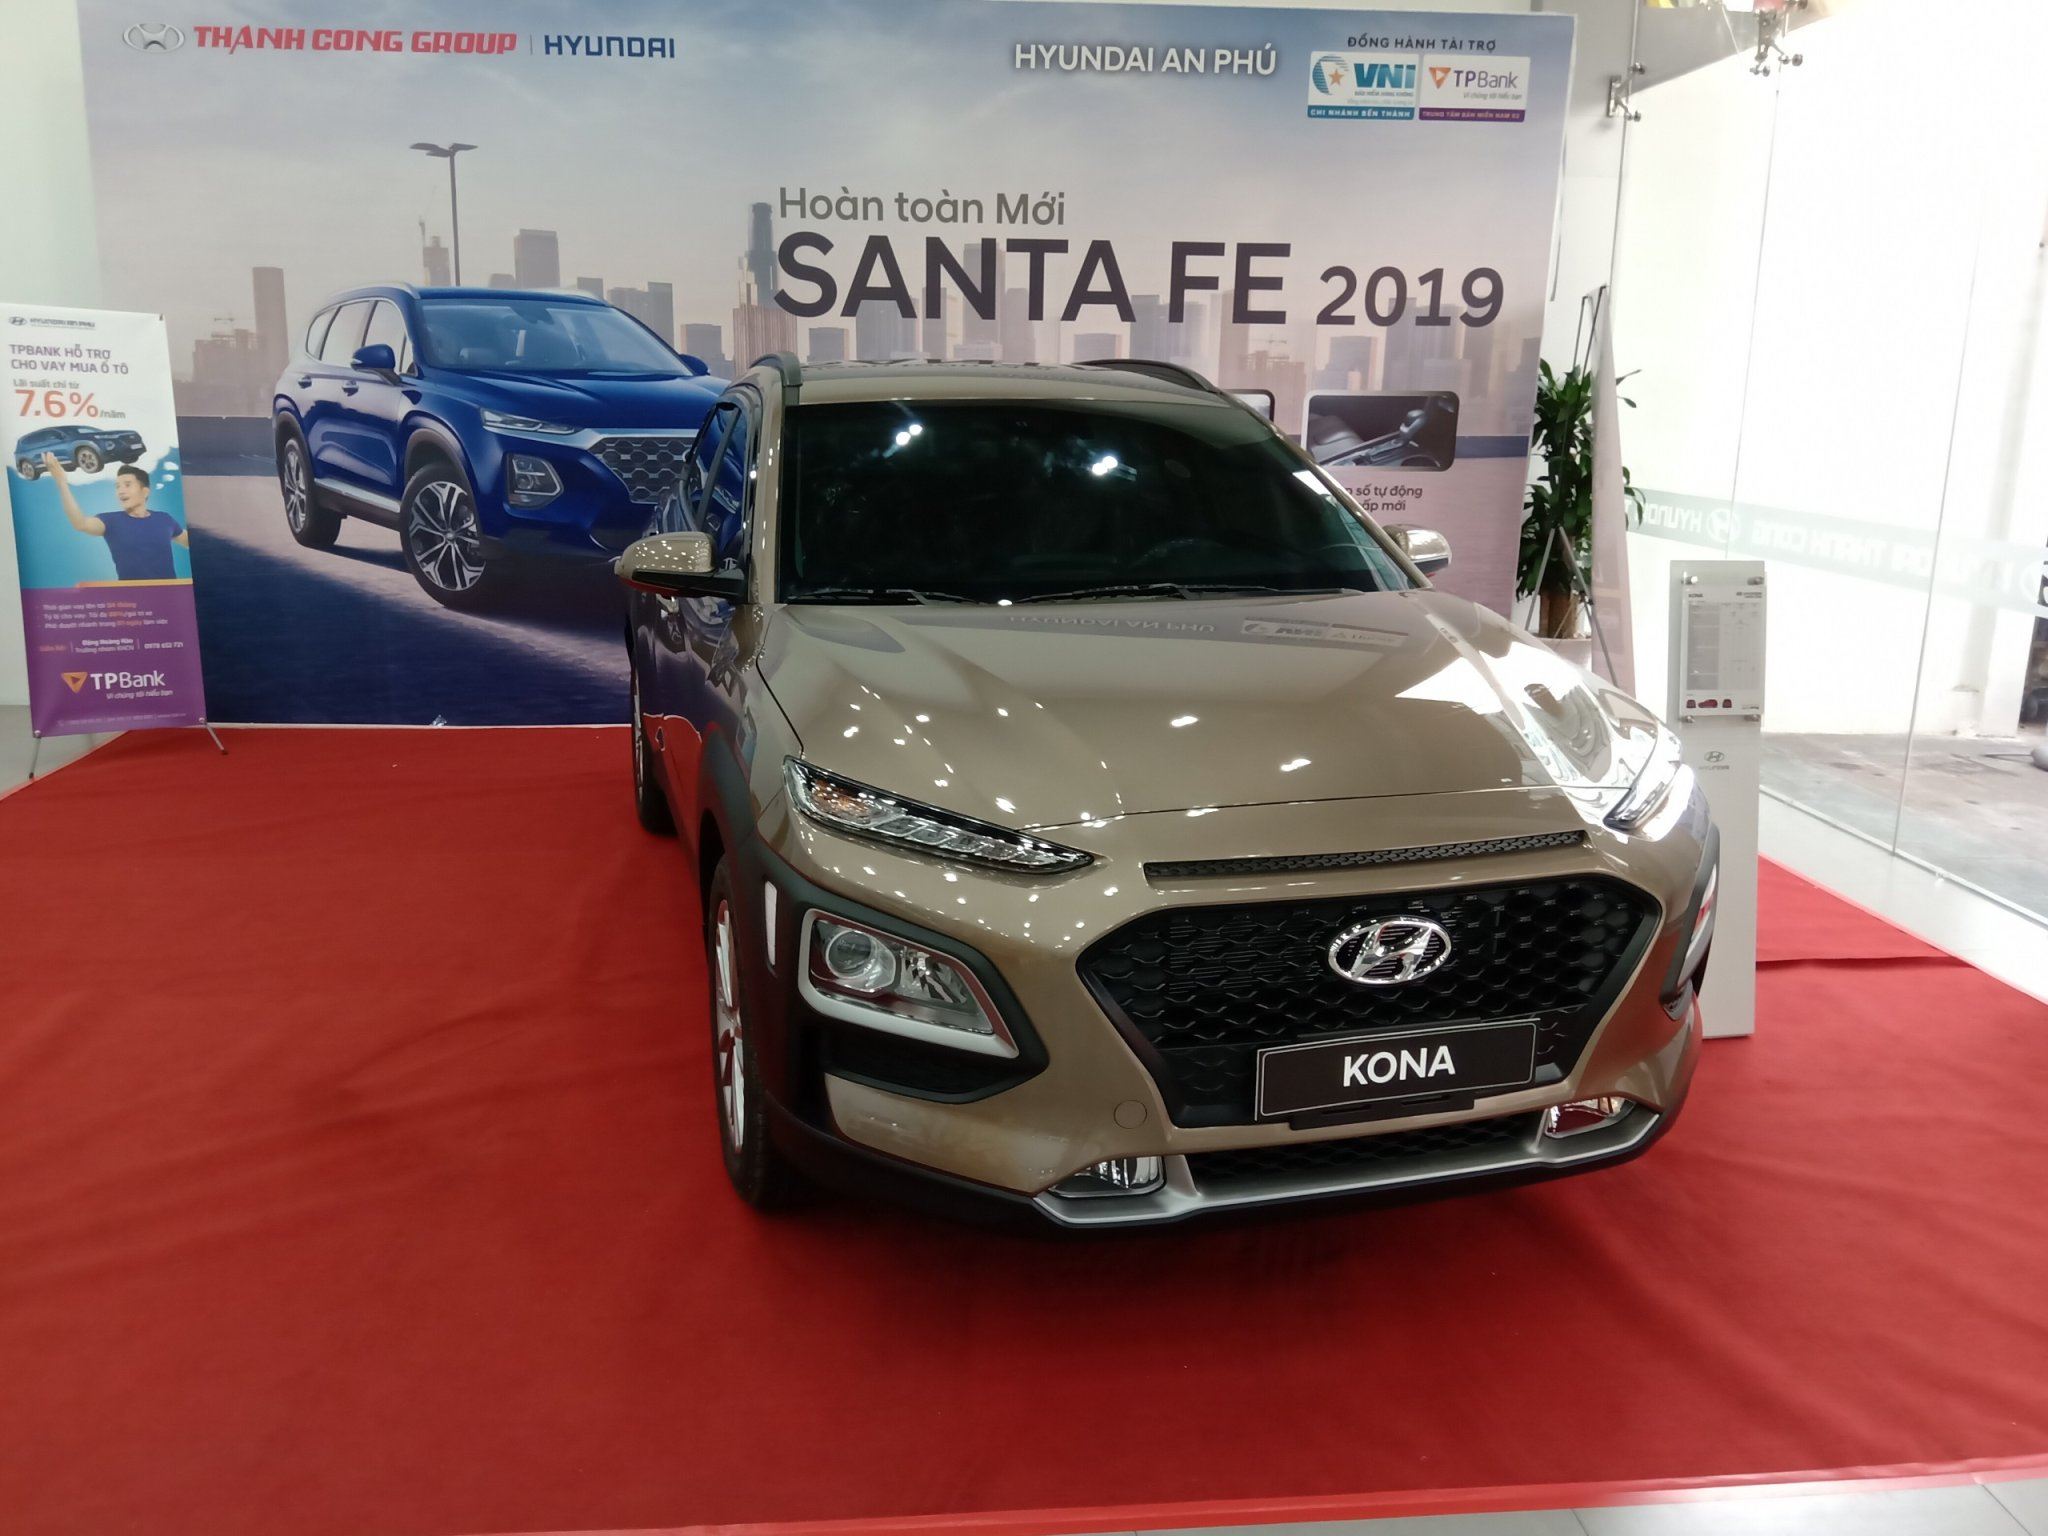 Hyundai Kona 2.0 tiêu chuẩn giá tốt, Hyundai An Phú, Hyundai Kona, Kona 2019, Xe Hyundai